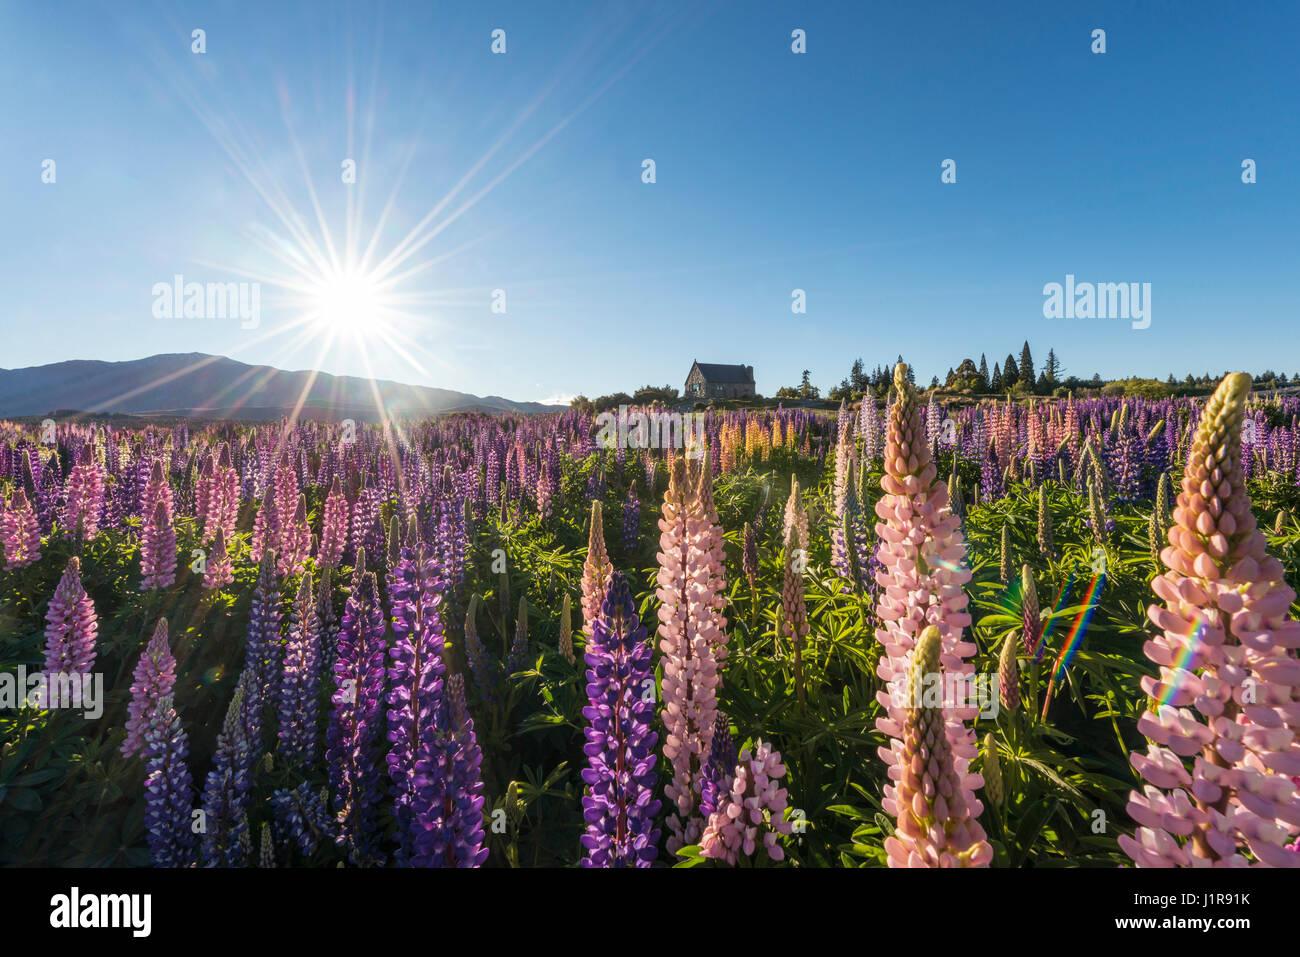 Sun shining through purple Large-leaved lupines (Lupinus polyphyllus), sunstern, Church of the Good Shepherd, Lake - Stock Image